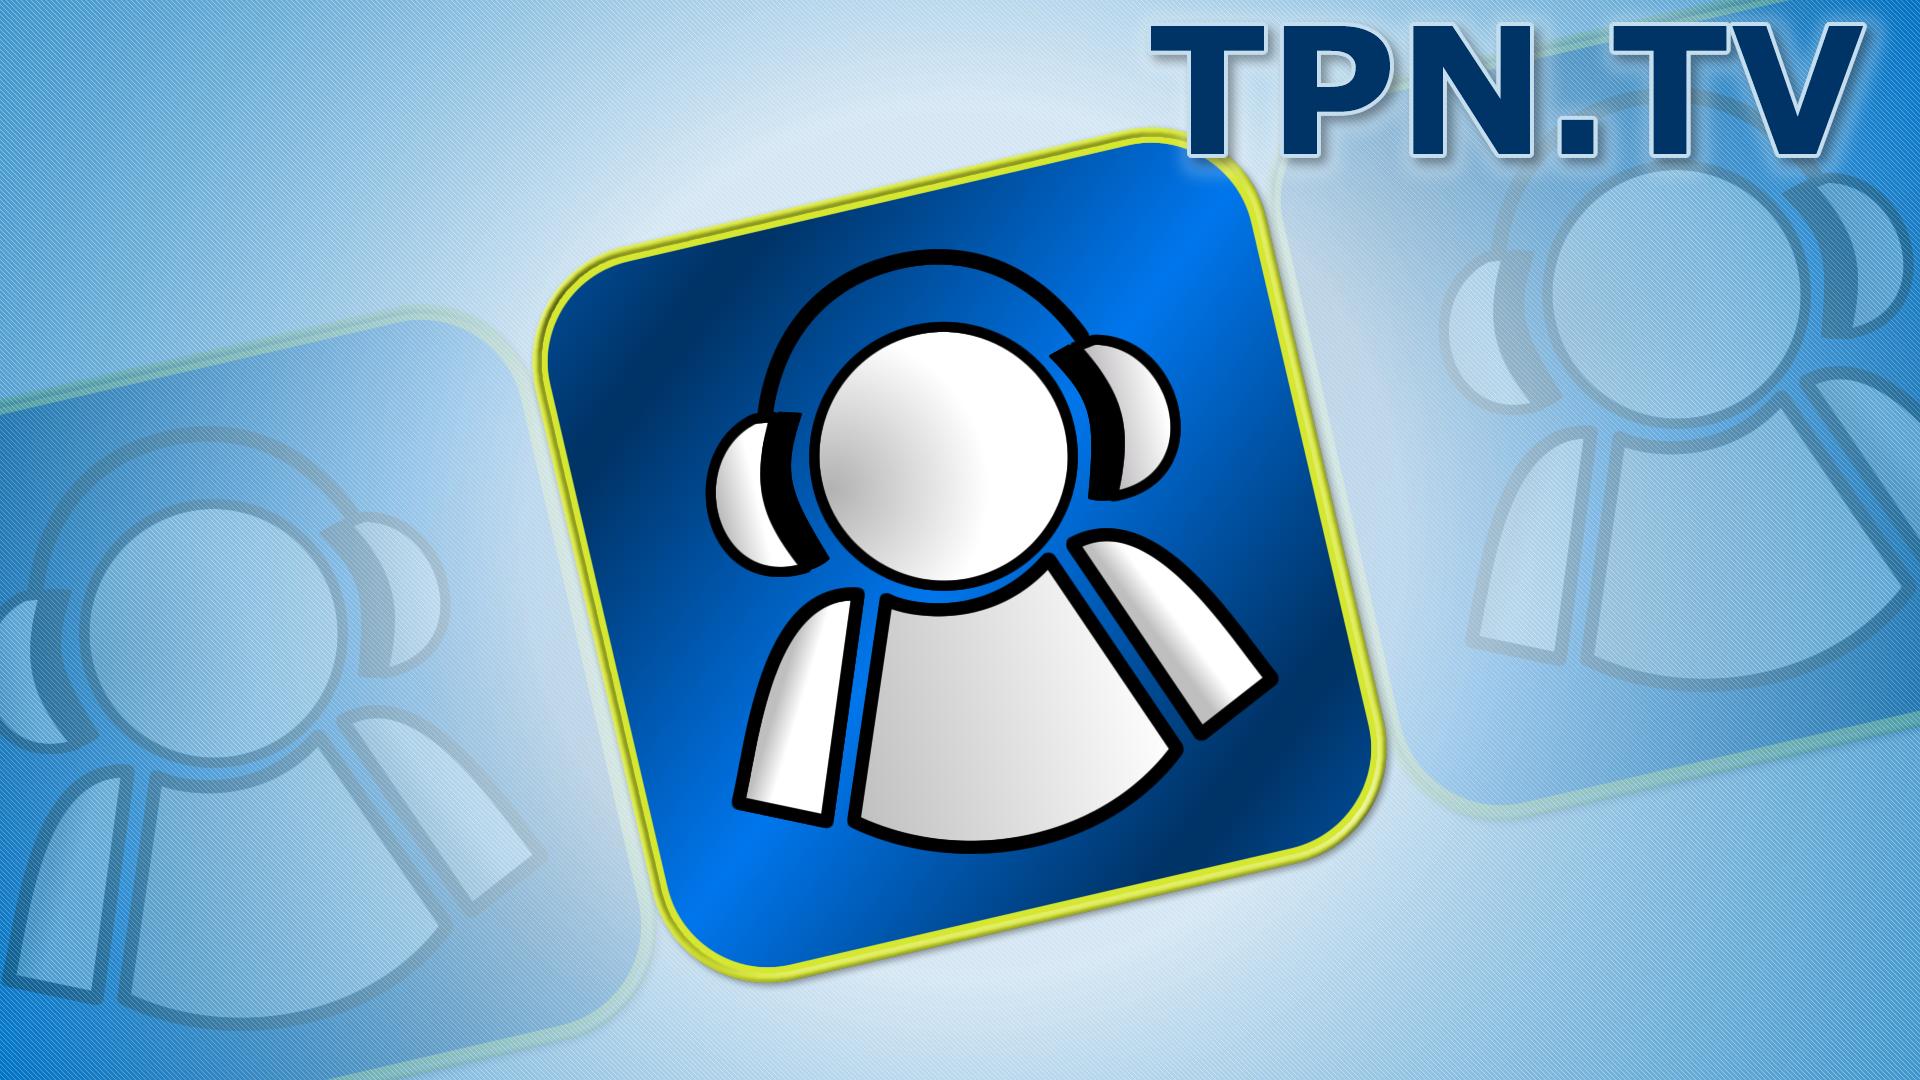 wifi Archives - TPN tv TPN tv